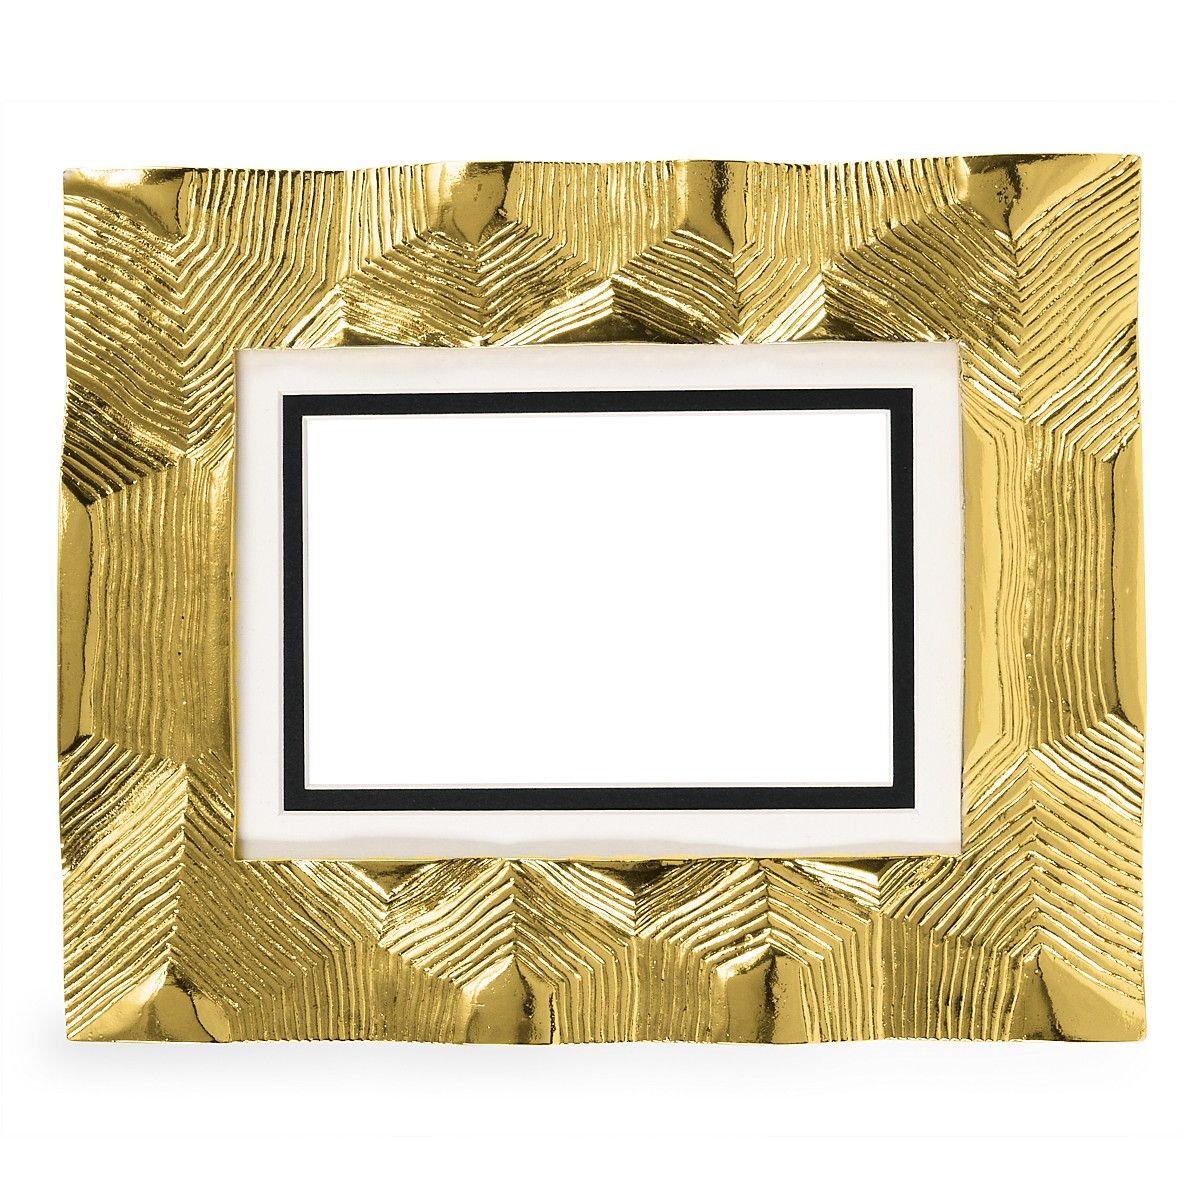 6 pane window frame ideas  michael aram frame  berenstain bears get the gimmes  pinterest